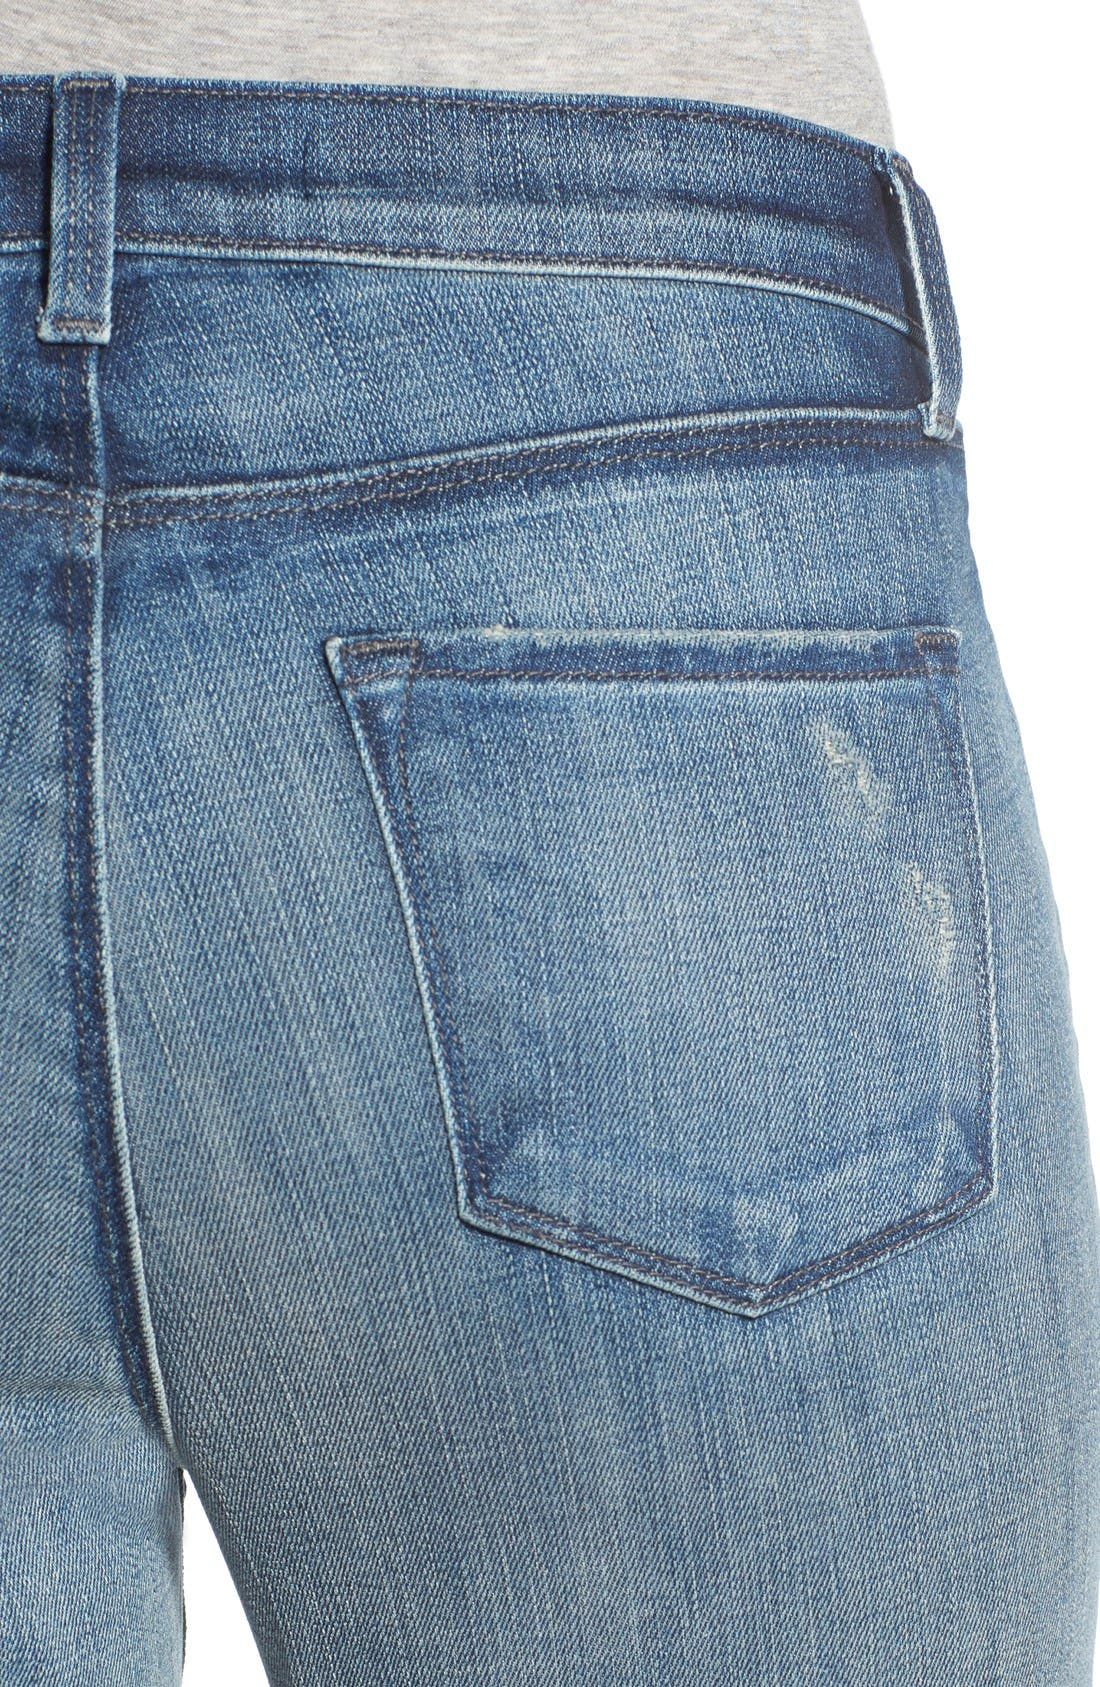 Alana Crop Skinny Jeans,                             Alternate thumbnail 4, color,